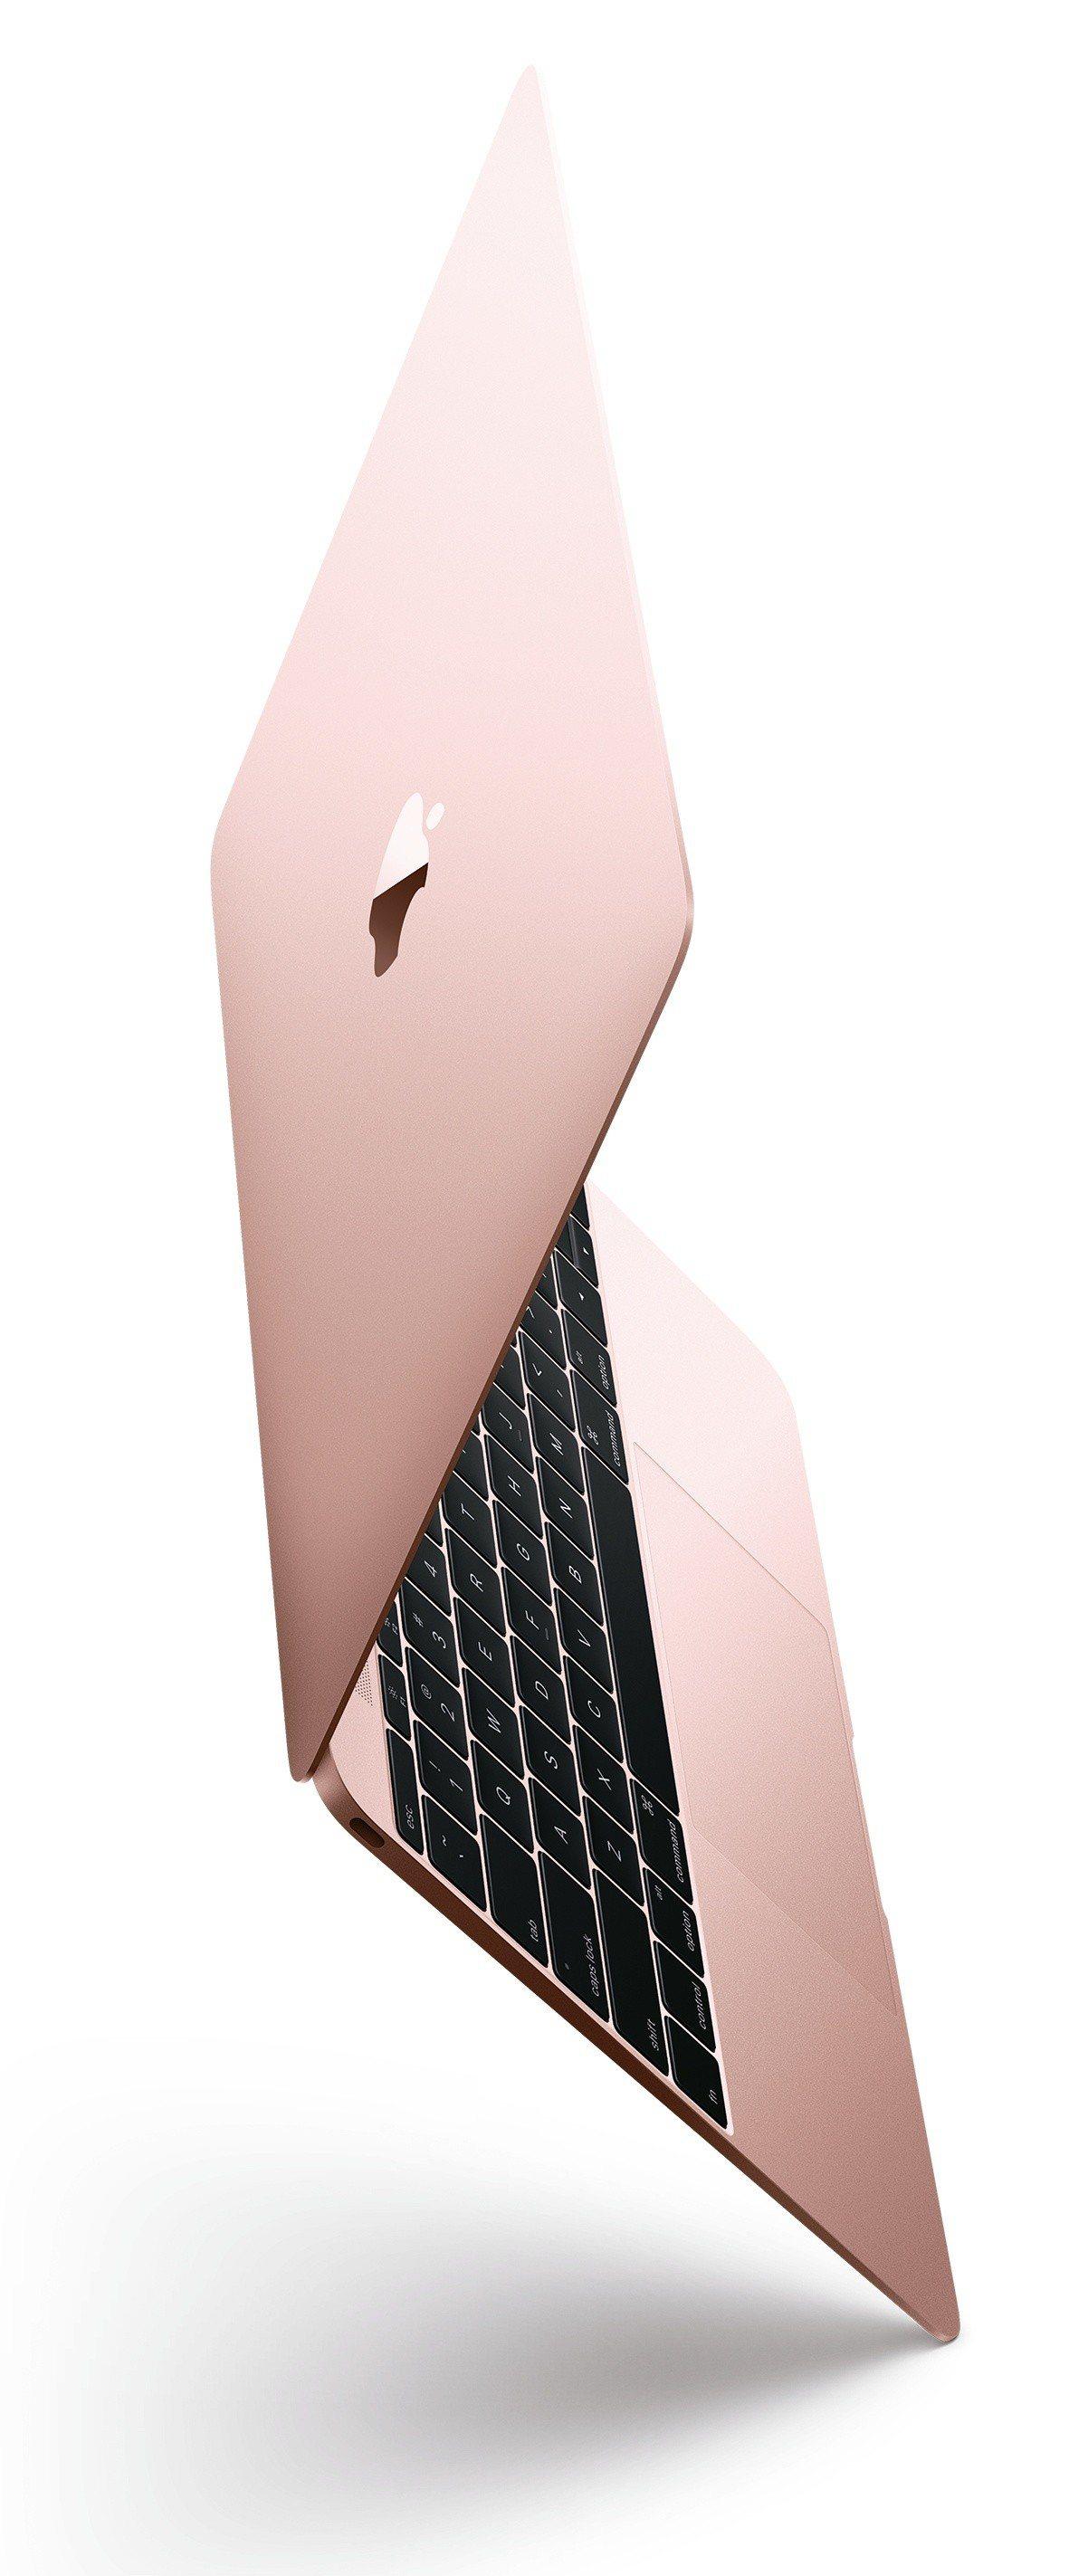 MacBook 12吋256GB市價41,900元,燦坤福利品優惠價34,999...